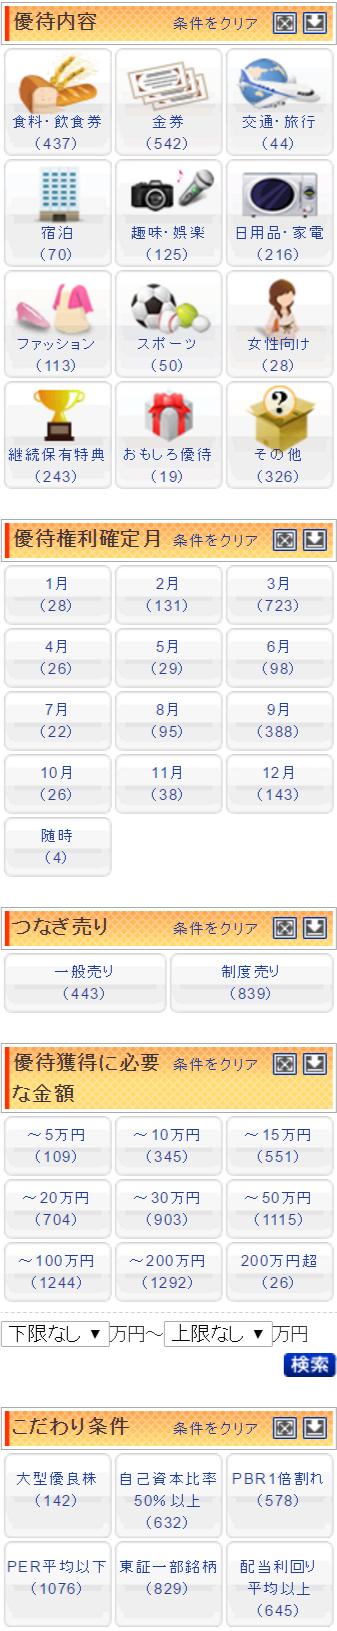 netsec-kabu-yuutai-osusume3